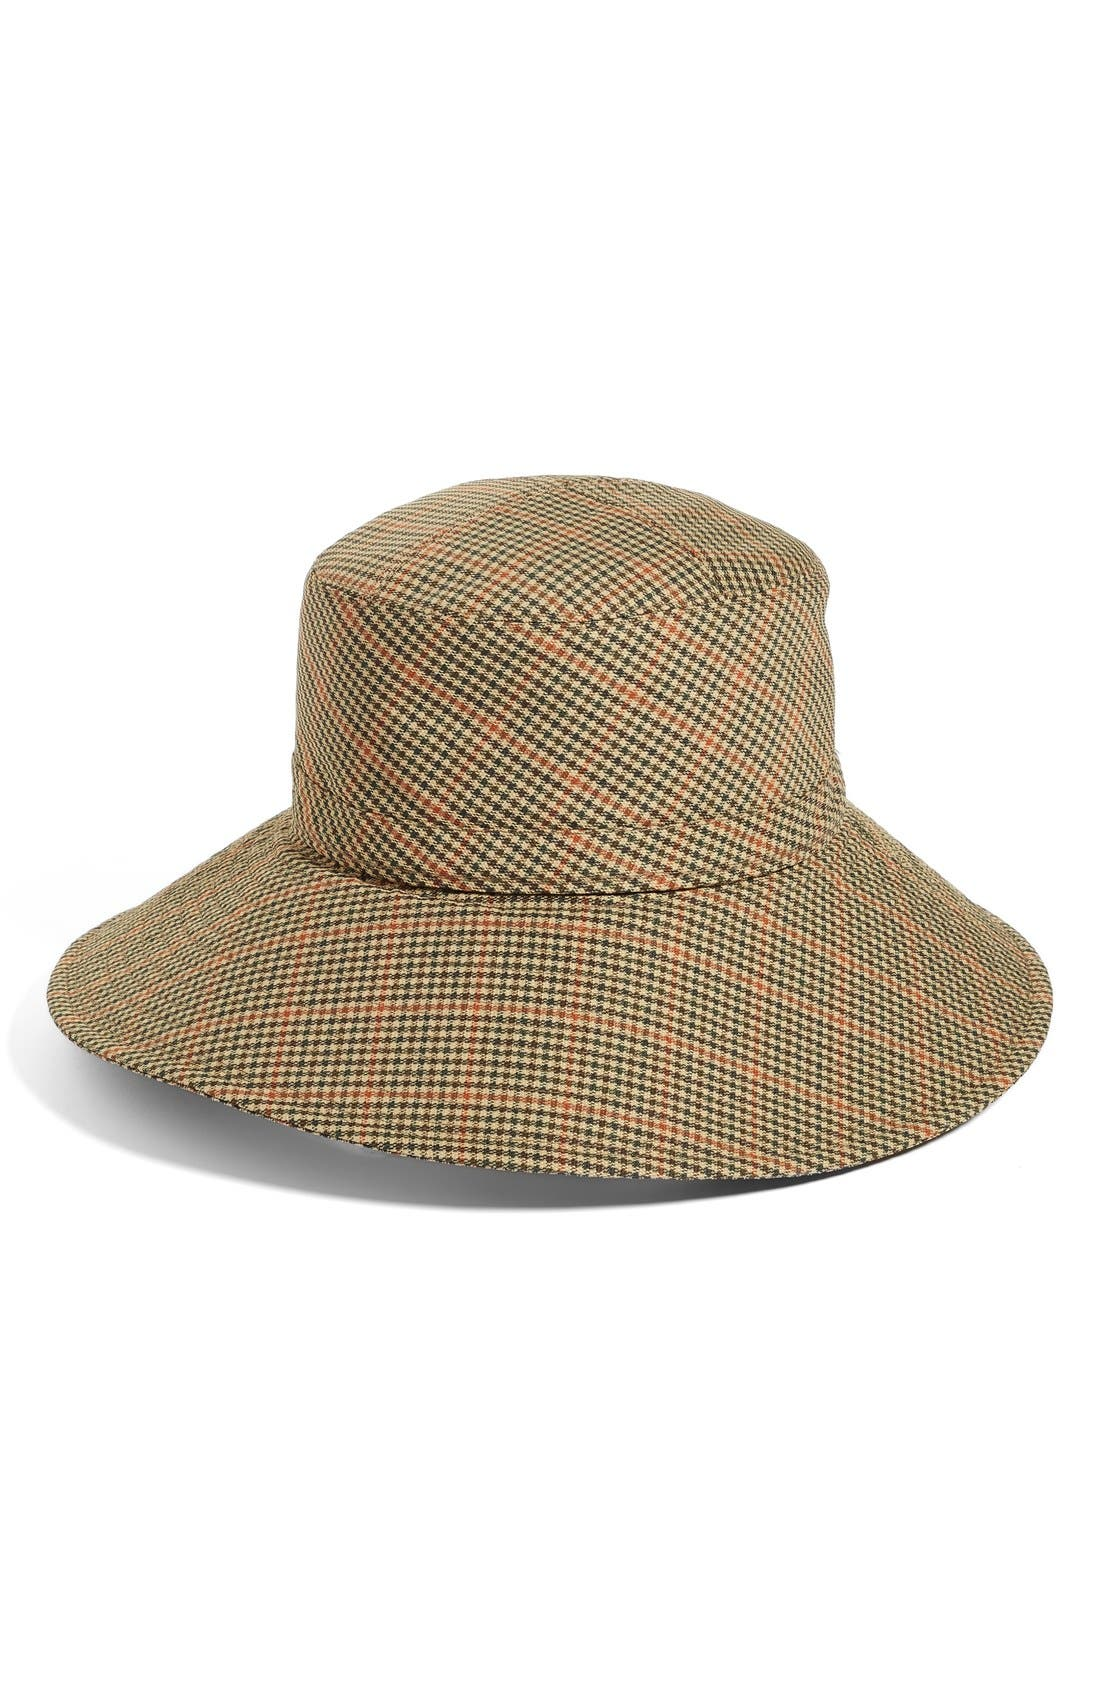 Water Repellent Nylon Rain Hat,                             Main thumbnail 1, color,                             Tan Check